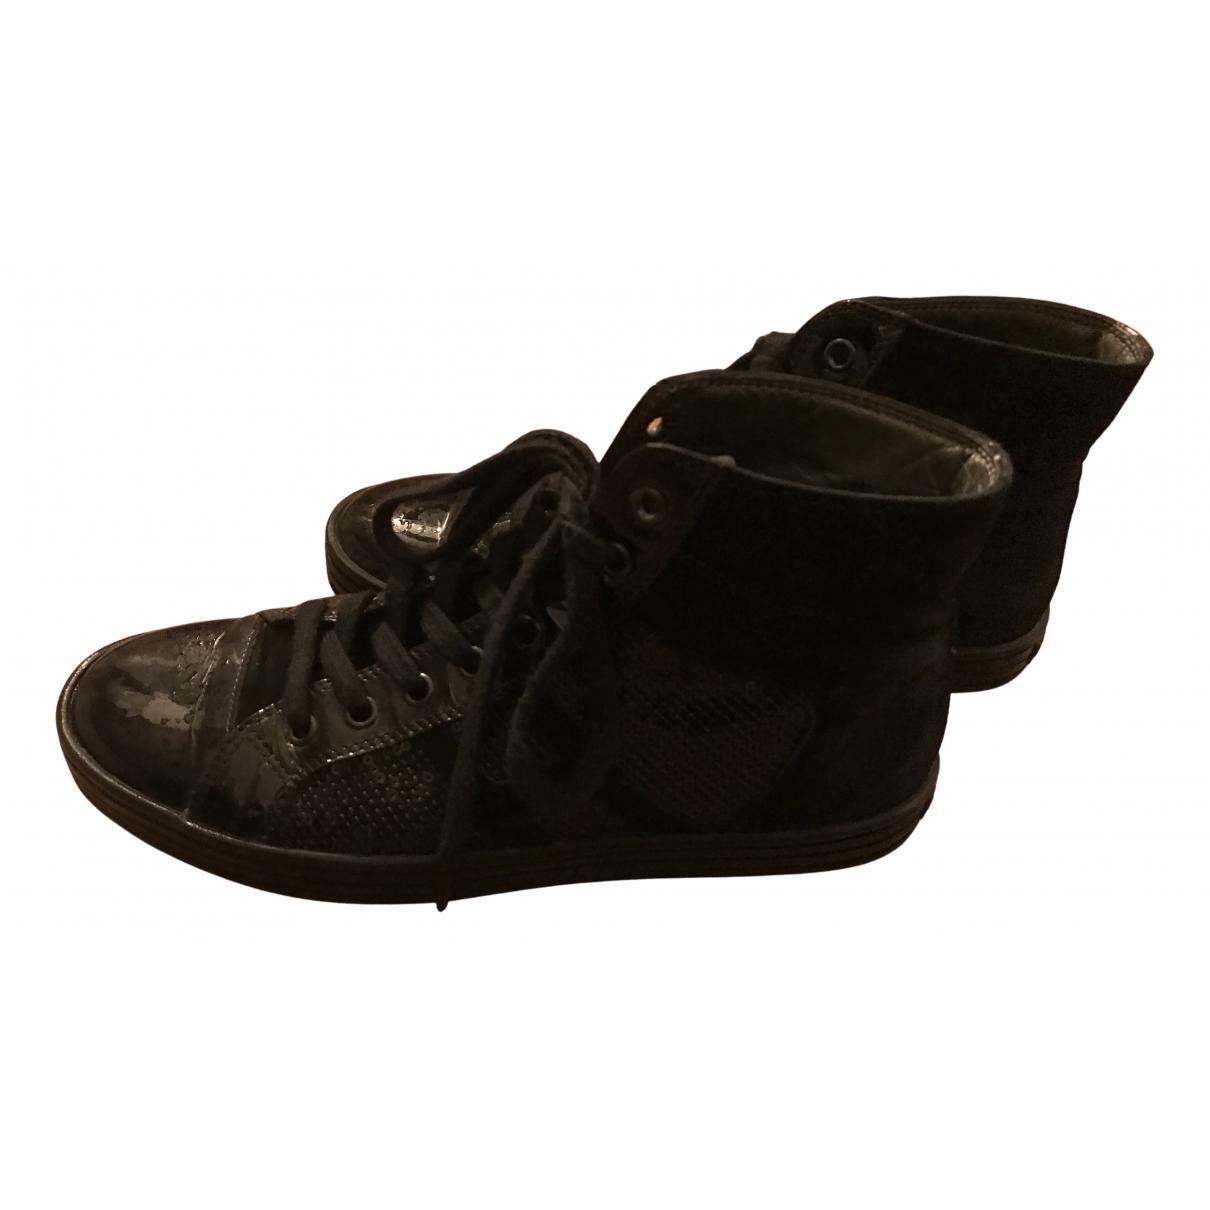 Hogan N Black Patent leather Trainers for Women 38 EU